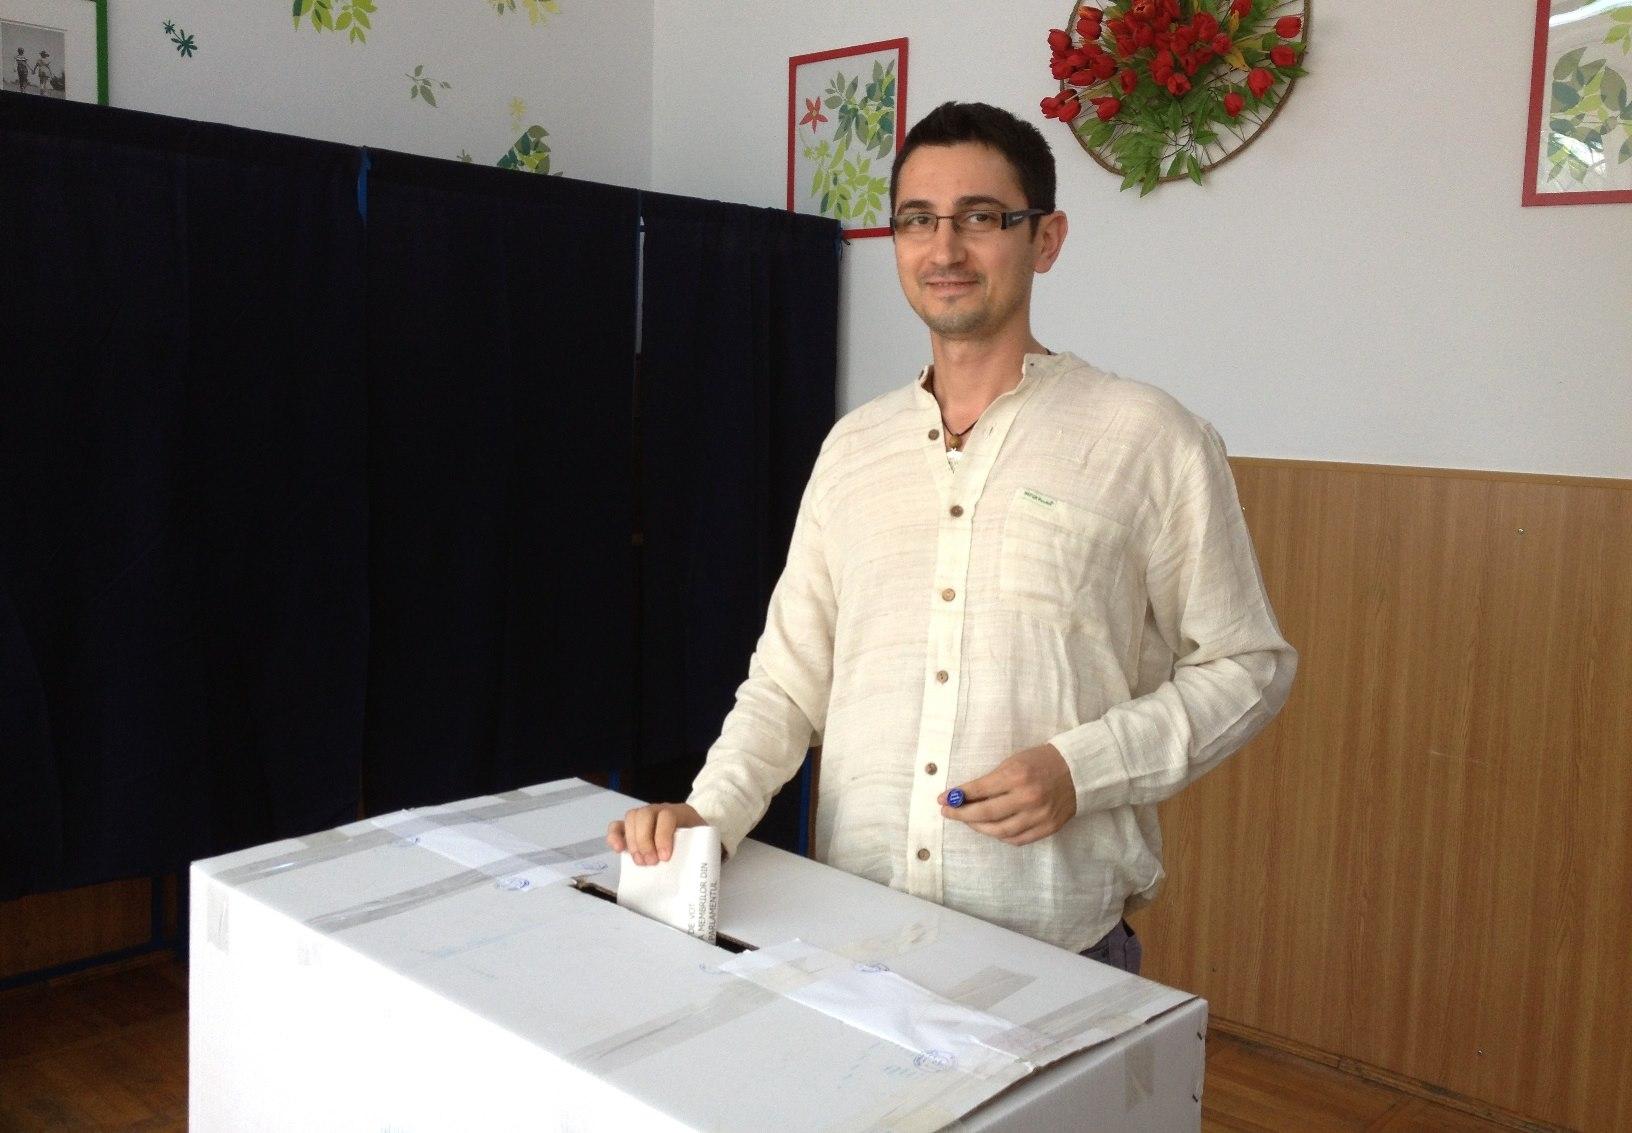 De ce merg la vot la alegerile europarlamentare